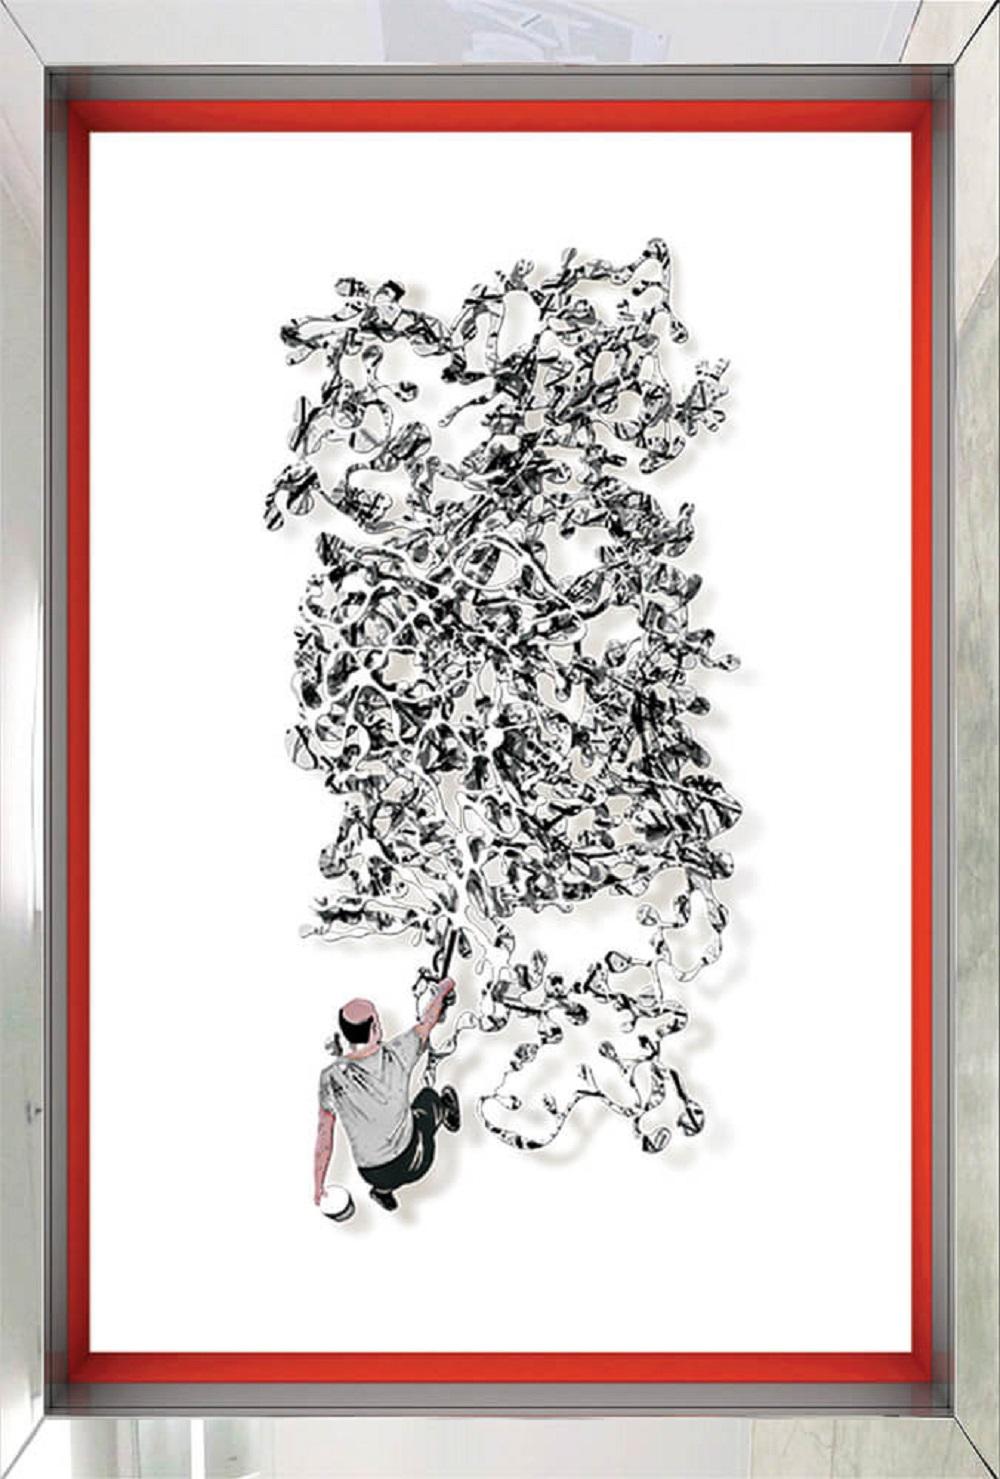 Homage to Jackson Pollock – B&W - David Kracov - Eden Gallery